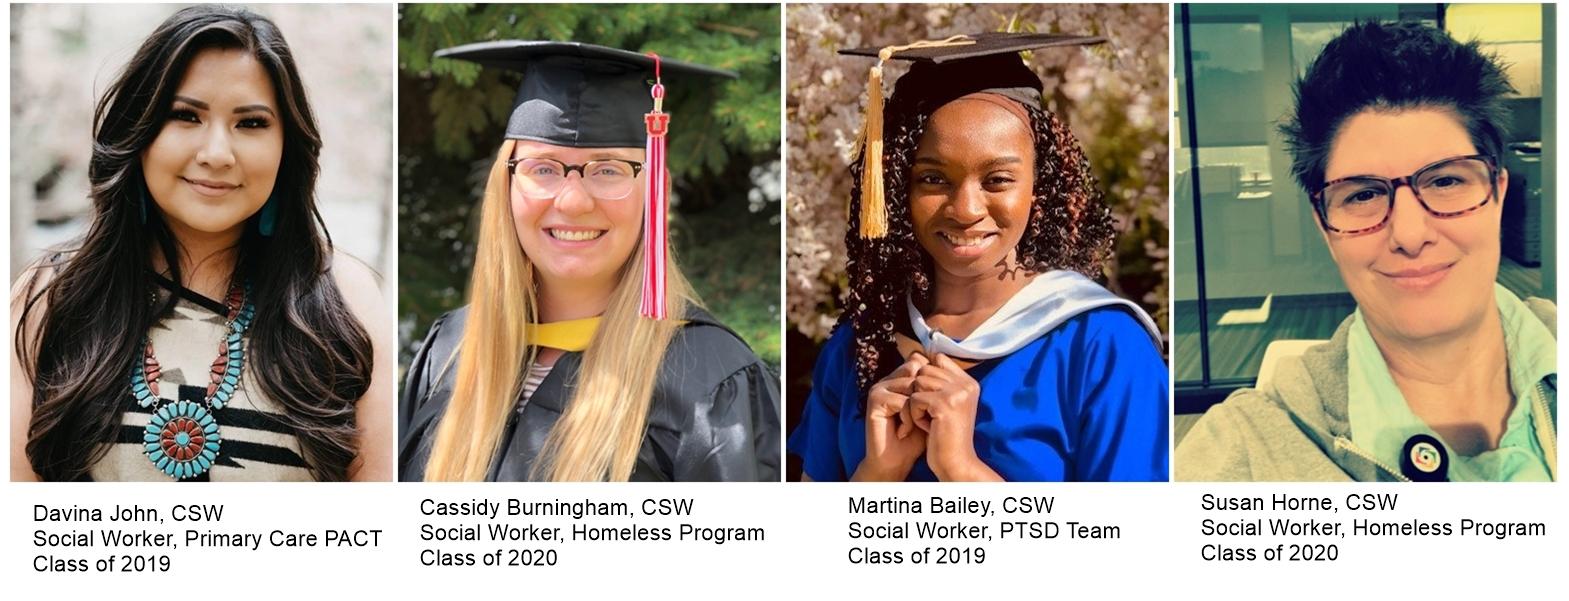 Headshots of four recent program graduates - left to right - Davina John; Cassidy Burningham; Martina Bailey; Susan Horne